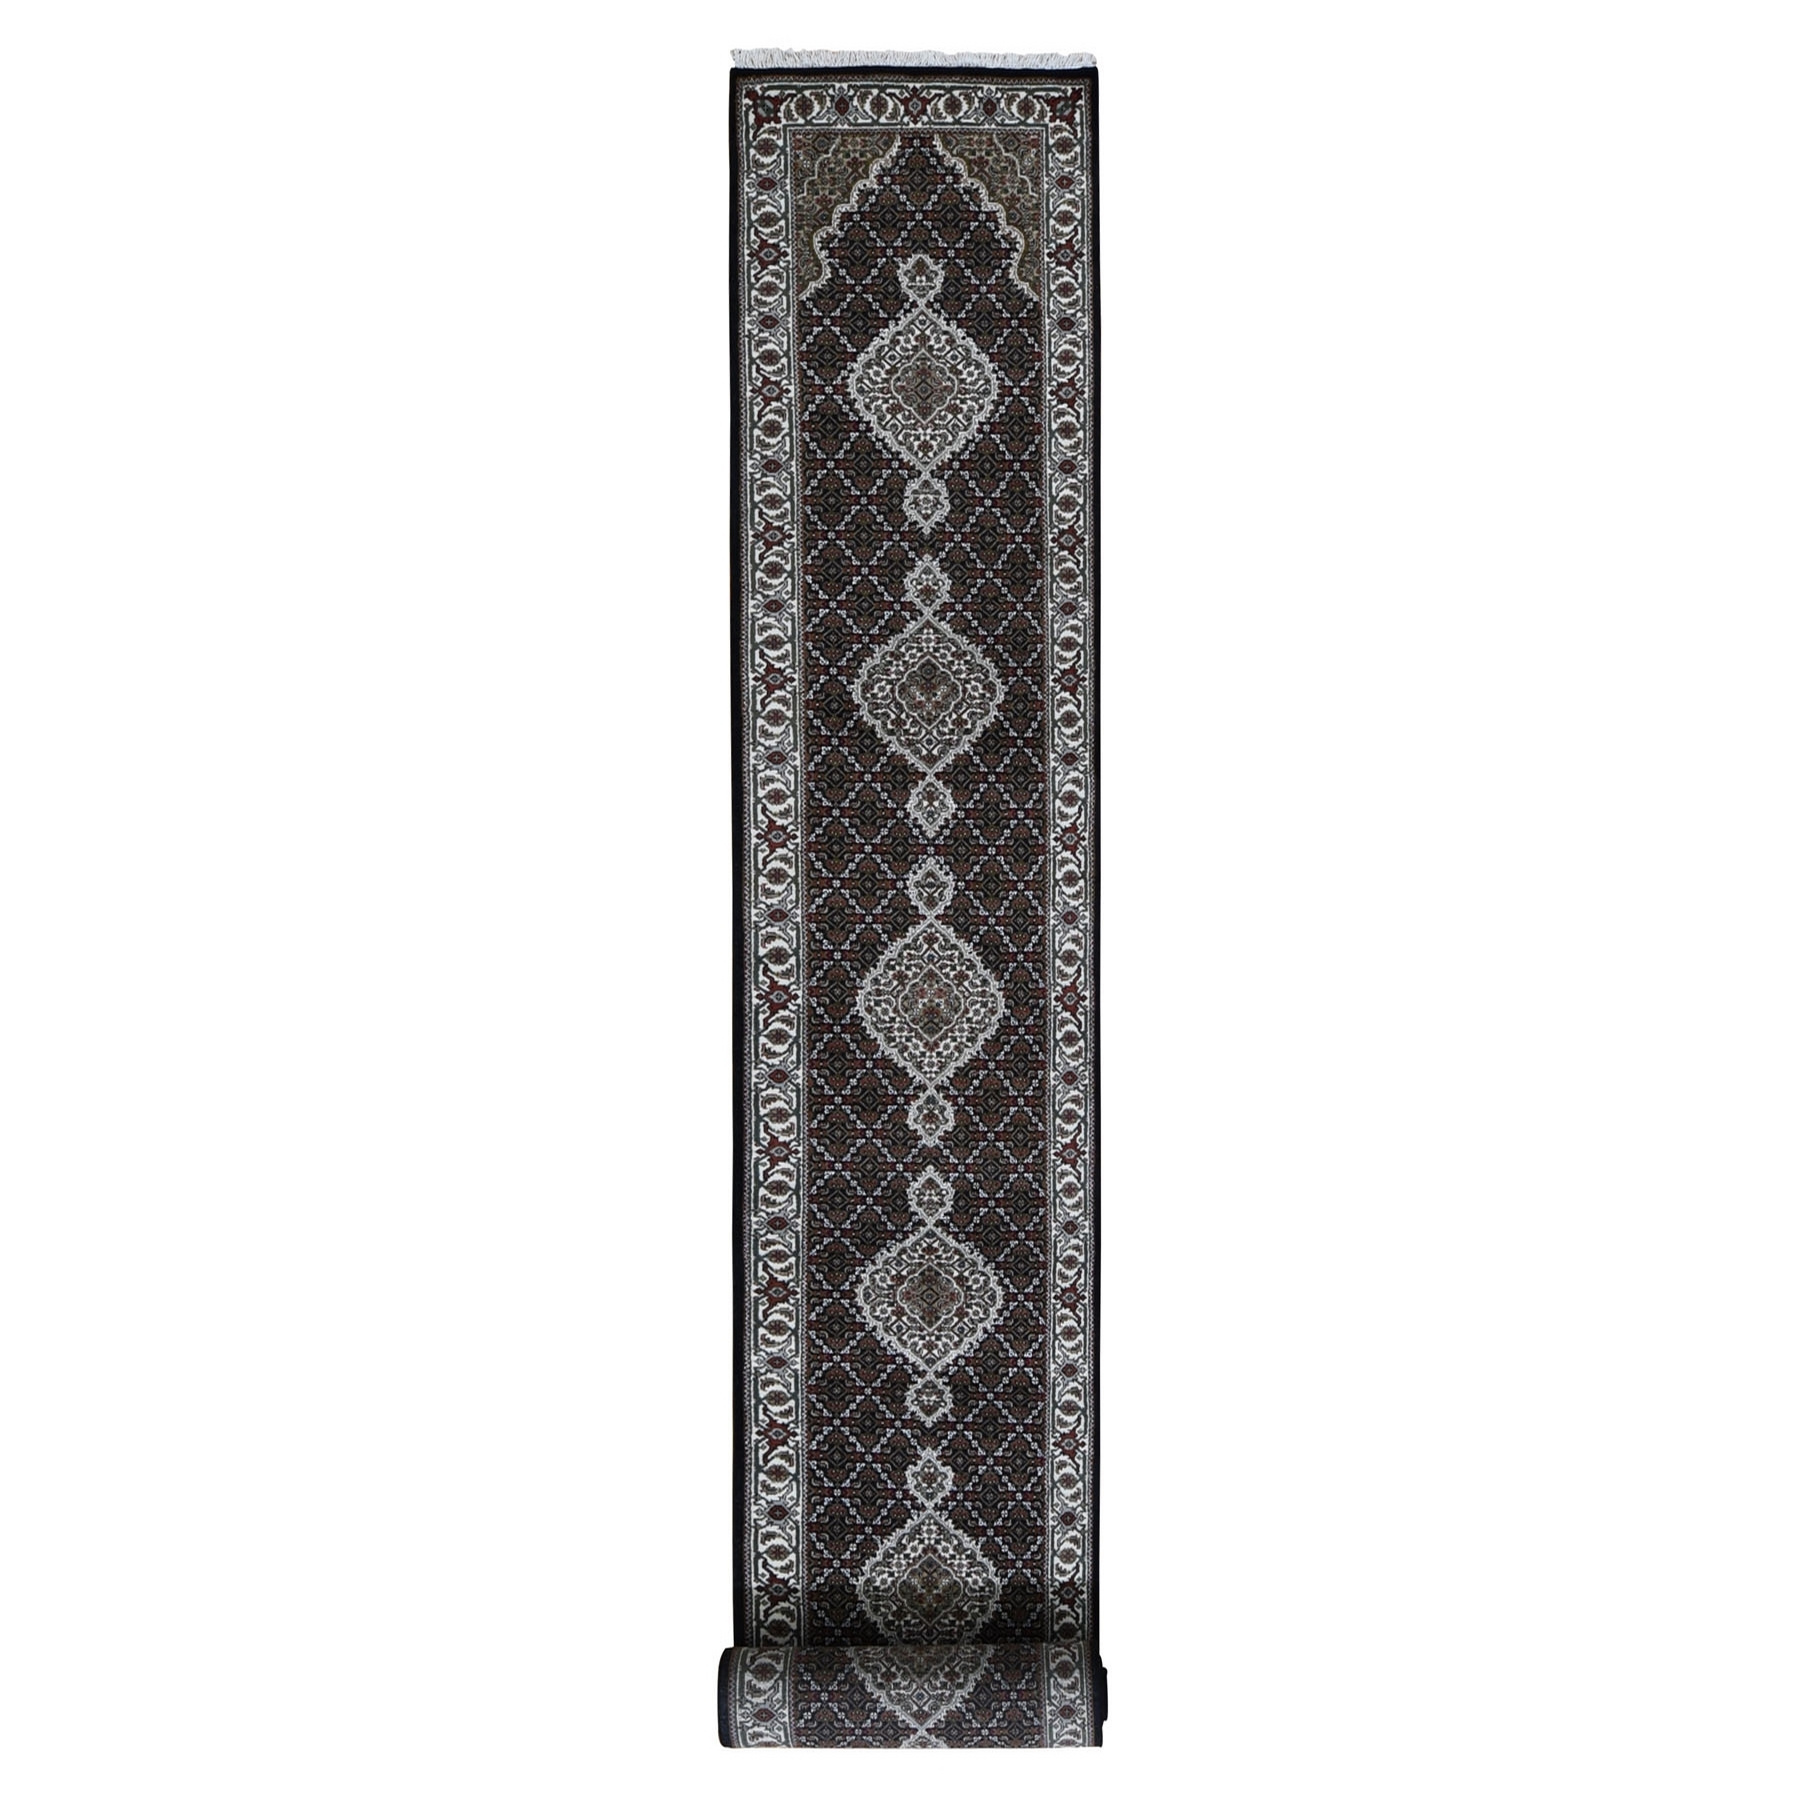 "2'8""X13'2""  Black Tabriz Mahi Wool And Silk Runner Hand Knotted Oriental Rug moad9ec6"